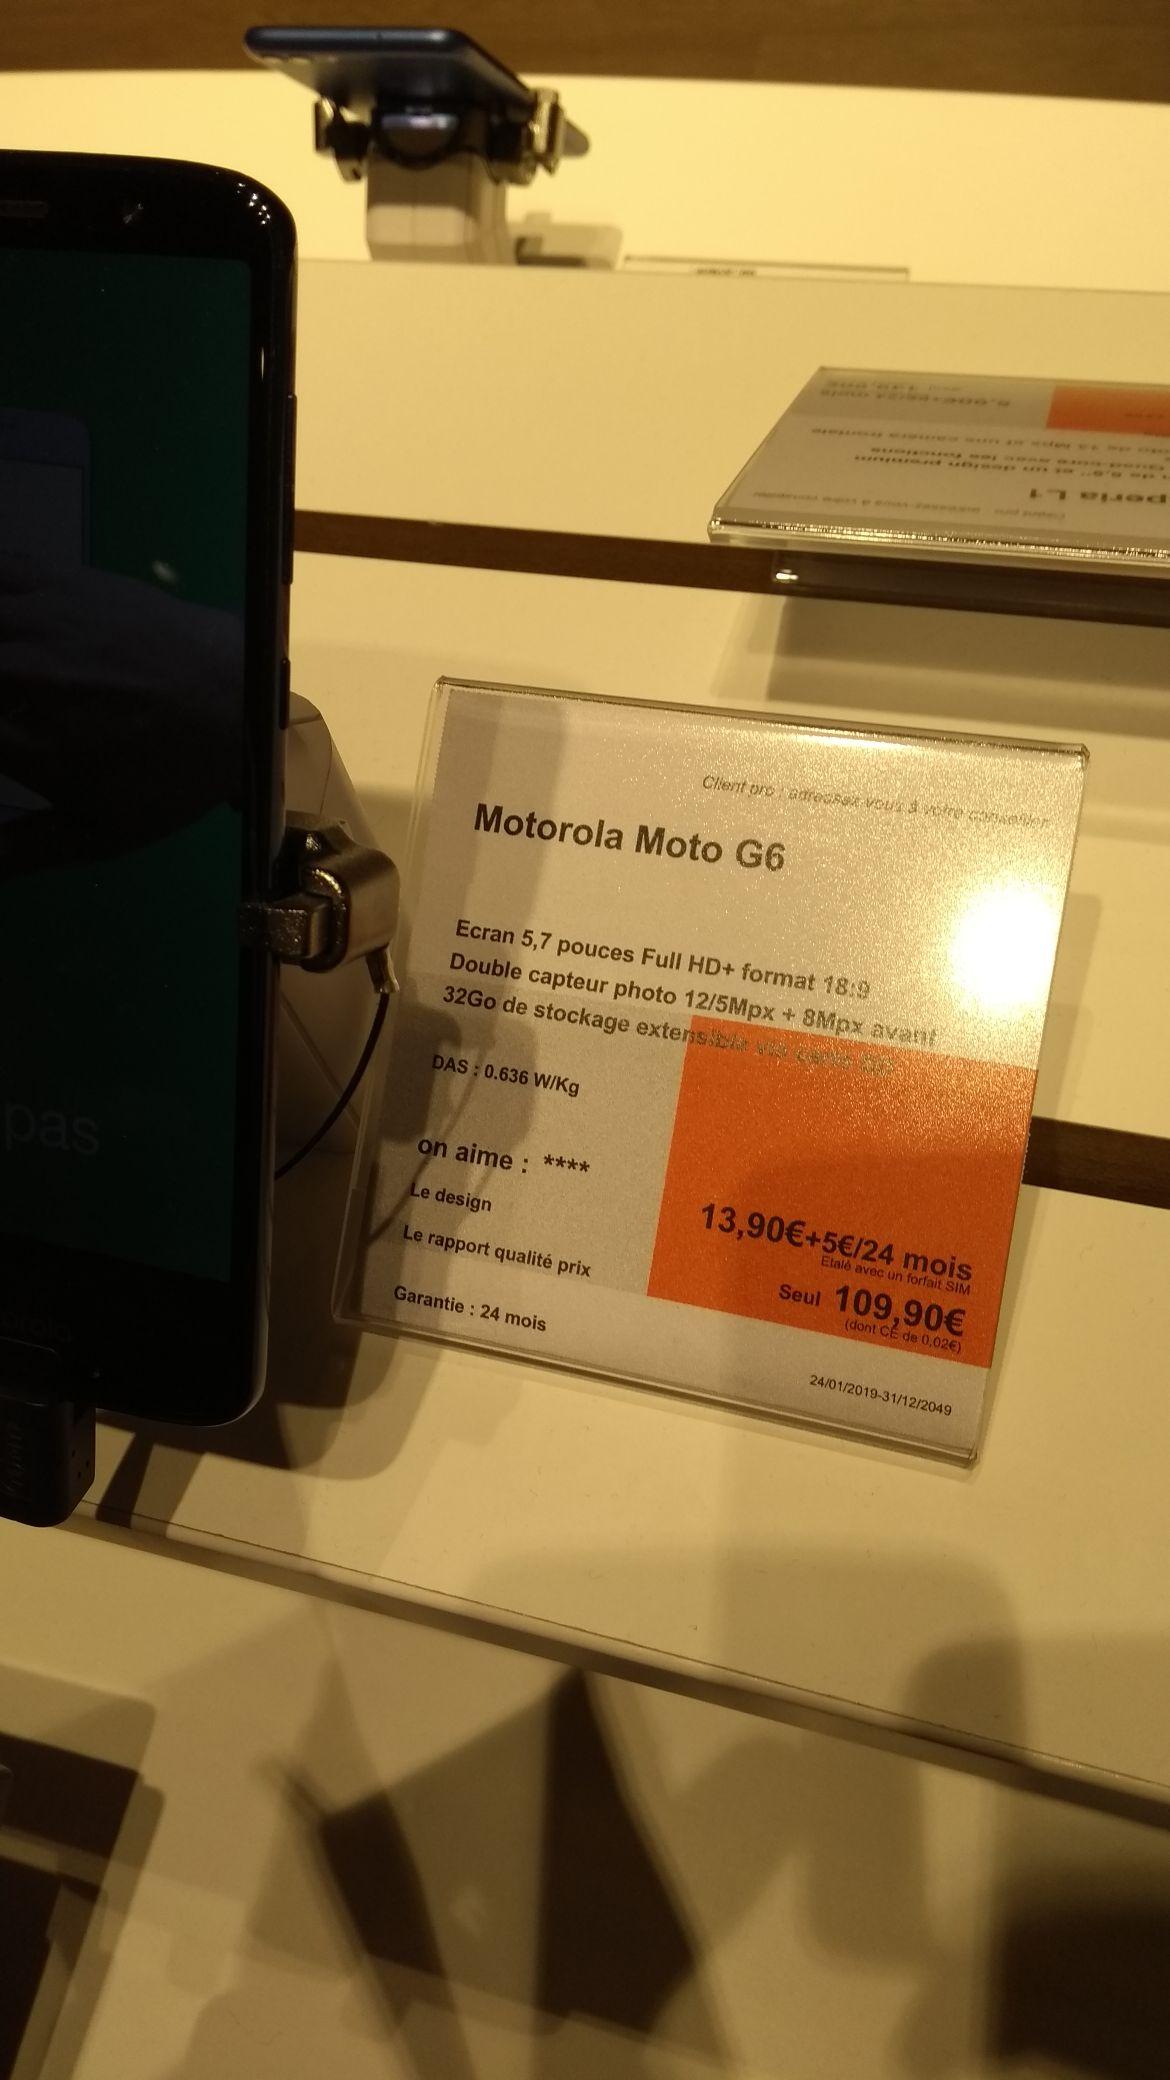 Smartphone 5.7 pouces Motorola Moto G6 (HD+, 32 Go) - St Herblain (44)